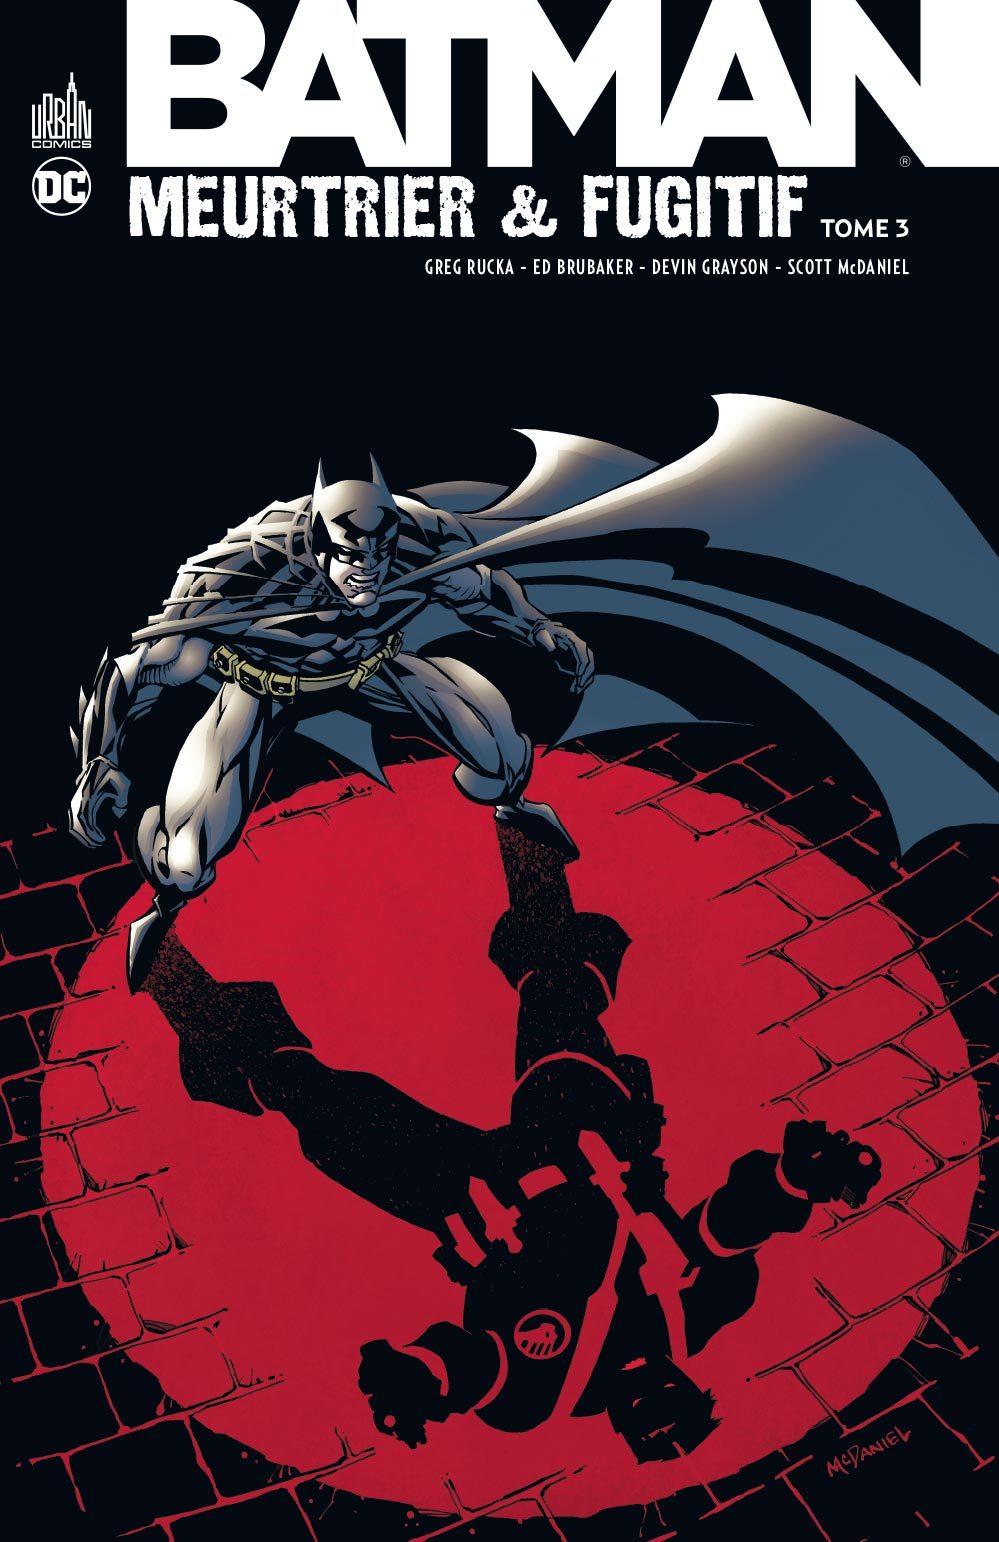 DC CLASSIQUES - BATMAN MEURTRIER & FUGITIF TOME 3